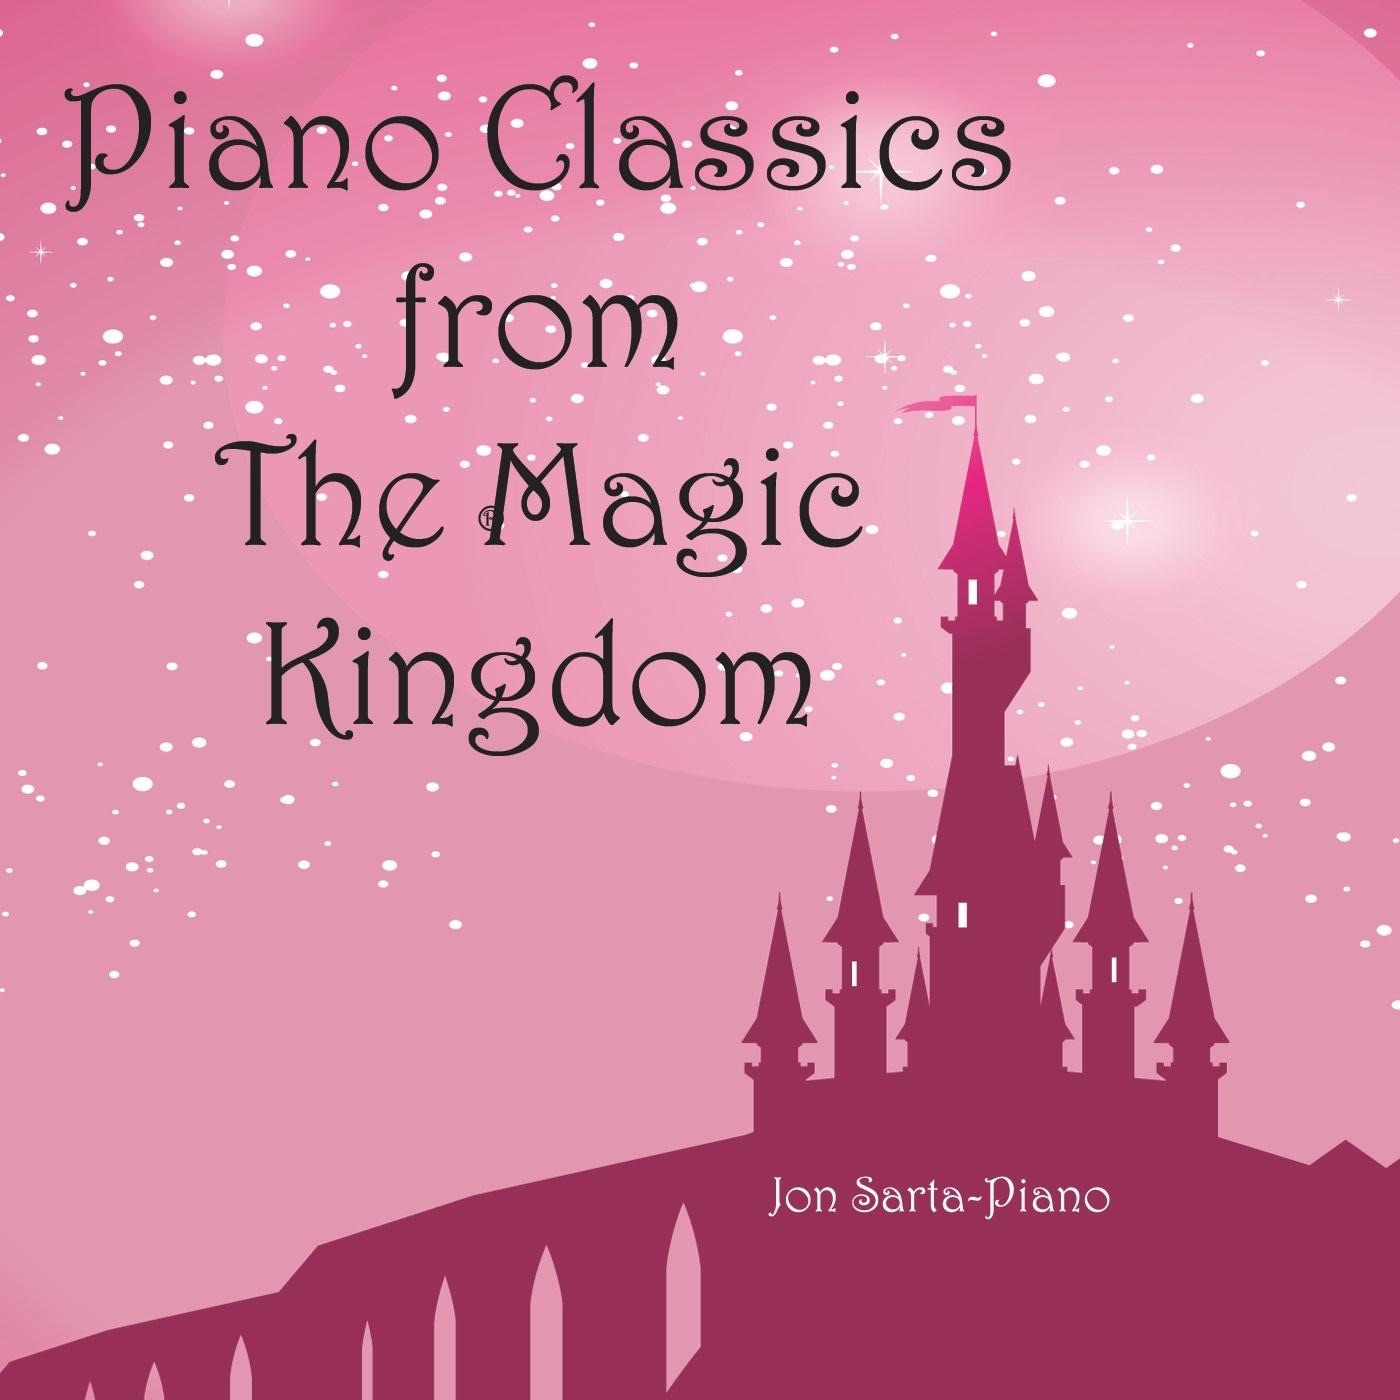 Piano Classics from the Magic Kingdom